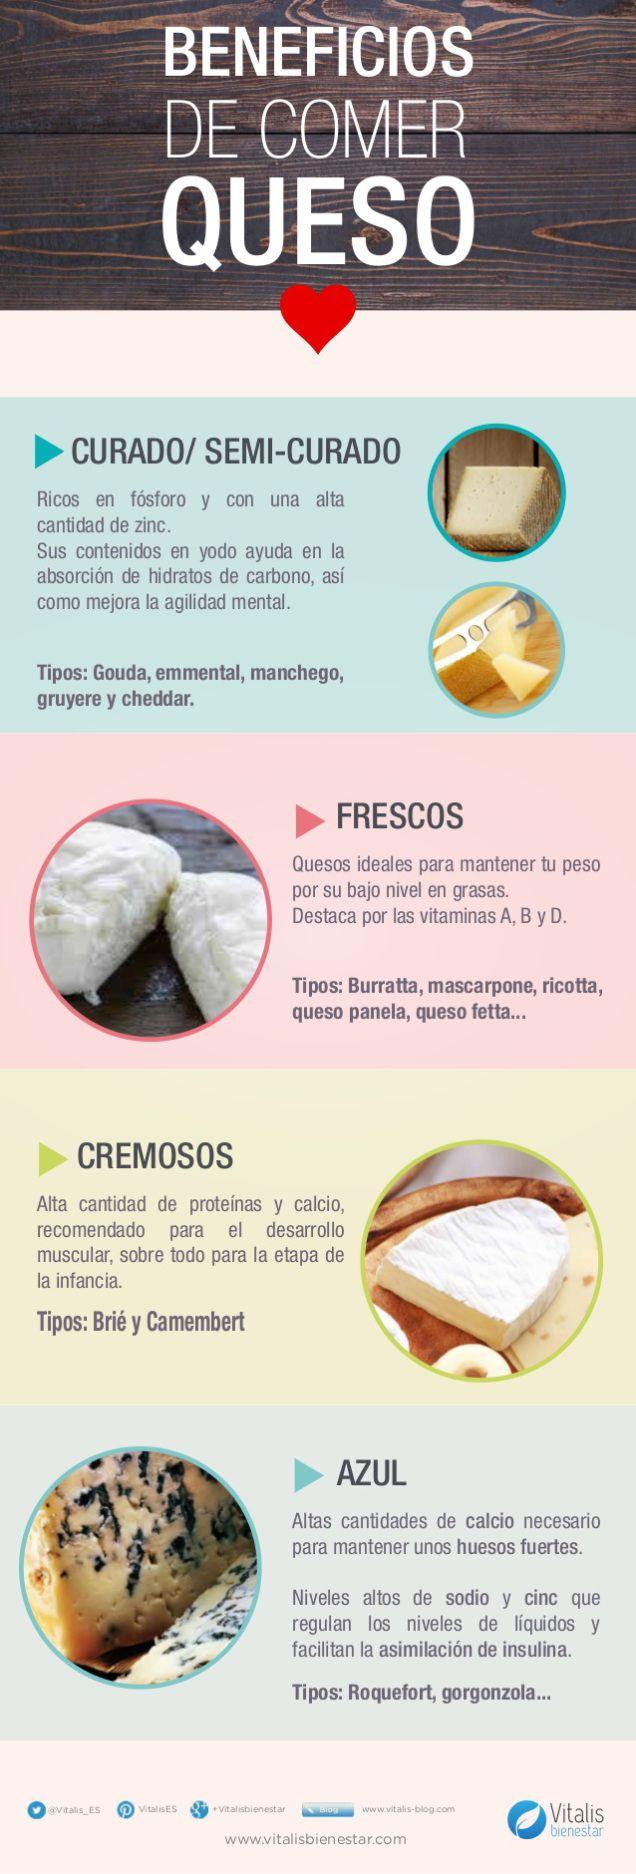 Beneficios De Comer Queso Infografia Infographic Health